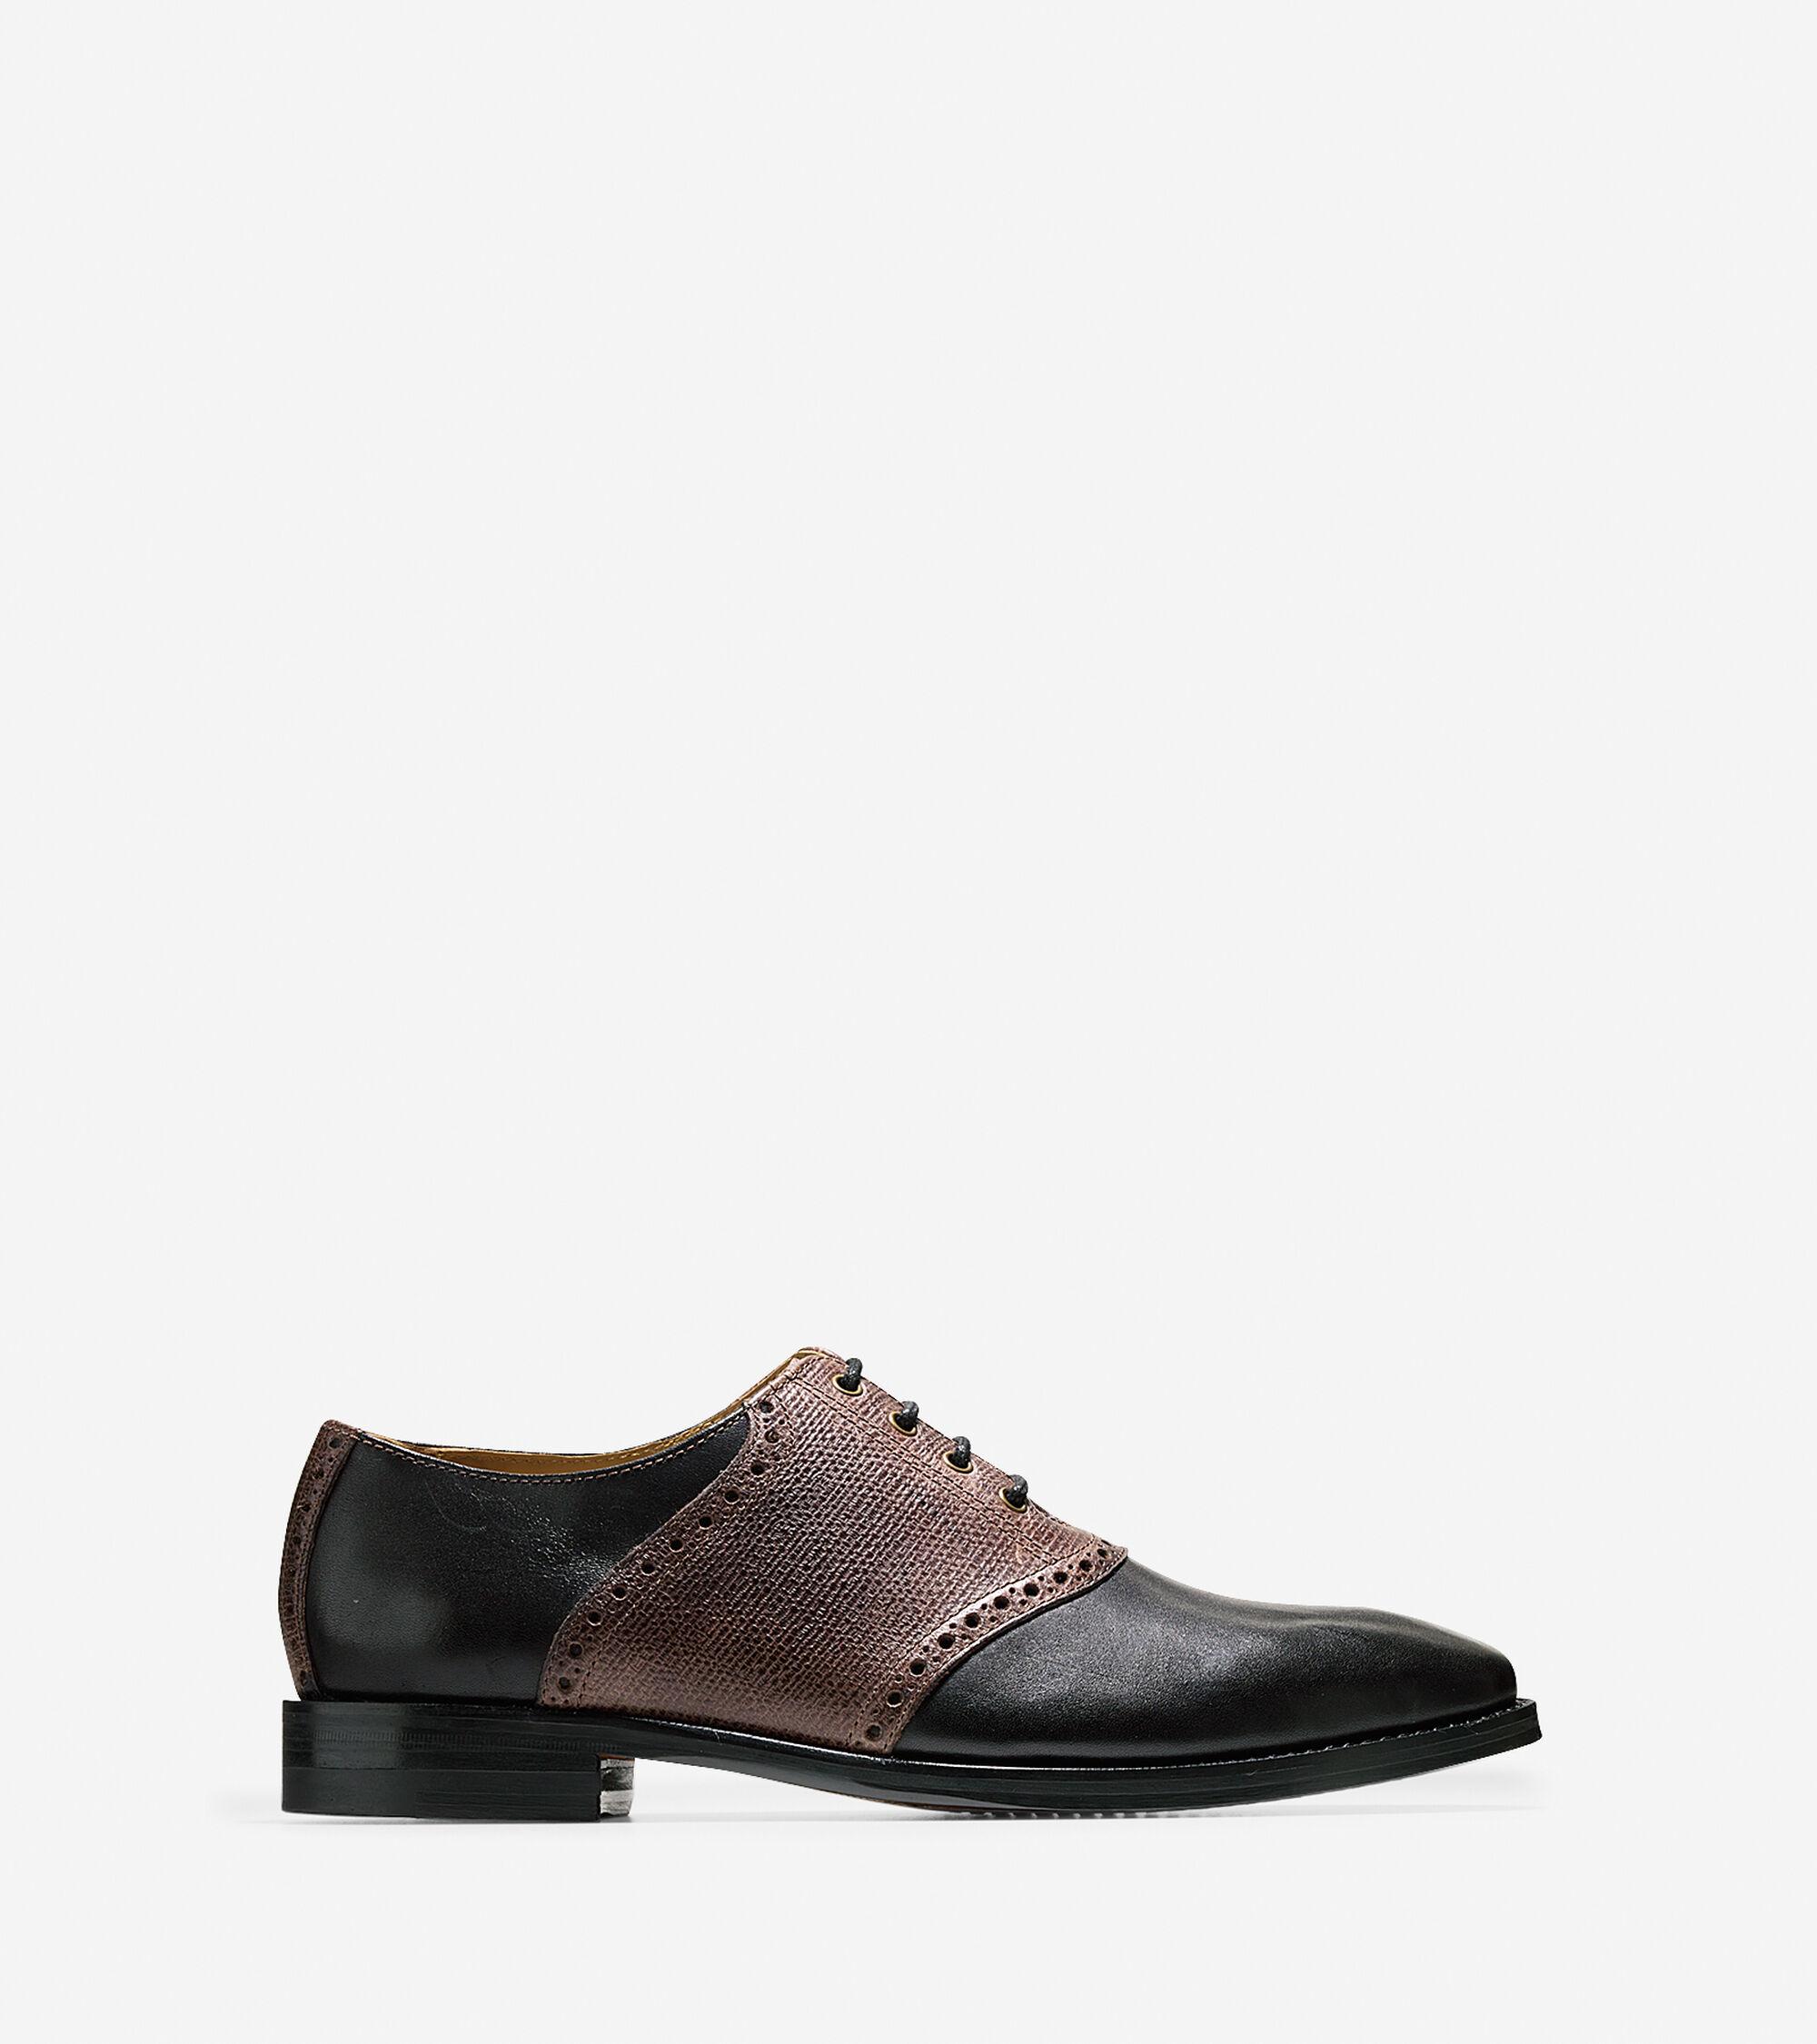 Shoes > Cambridge Casual Saddle